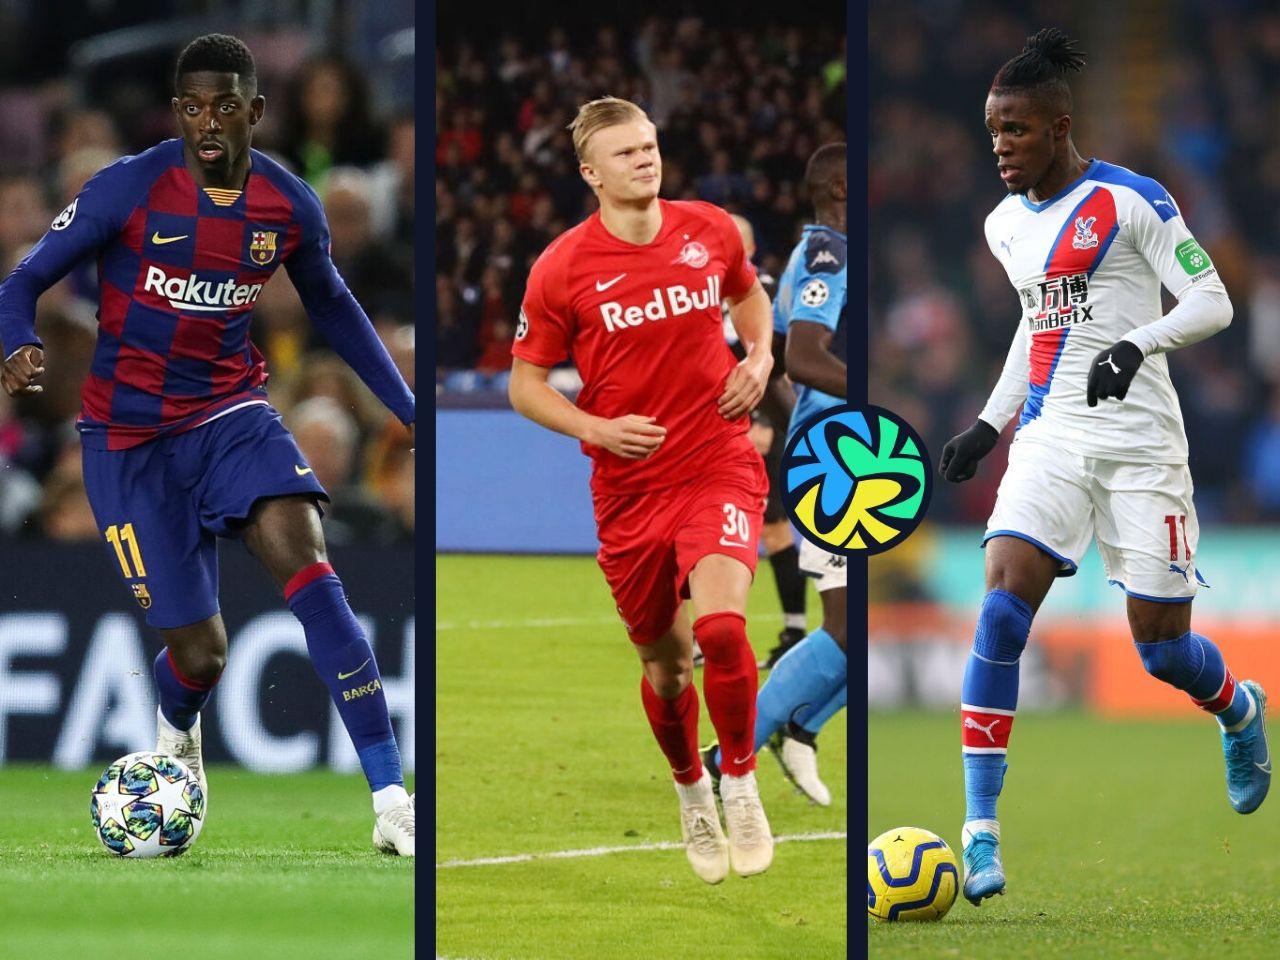 Ousmane Dembele, Erling Haaland, Wilfried Zaha